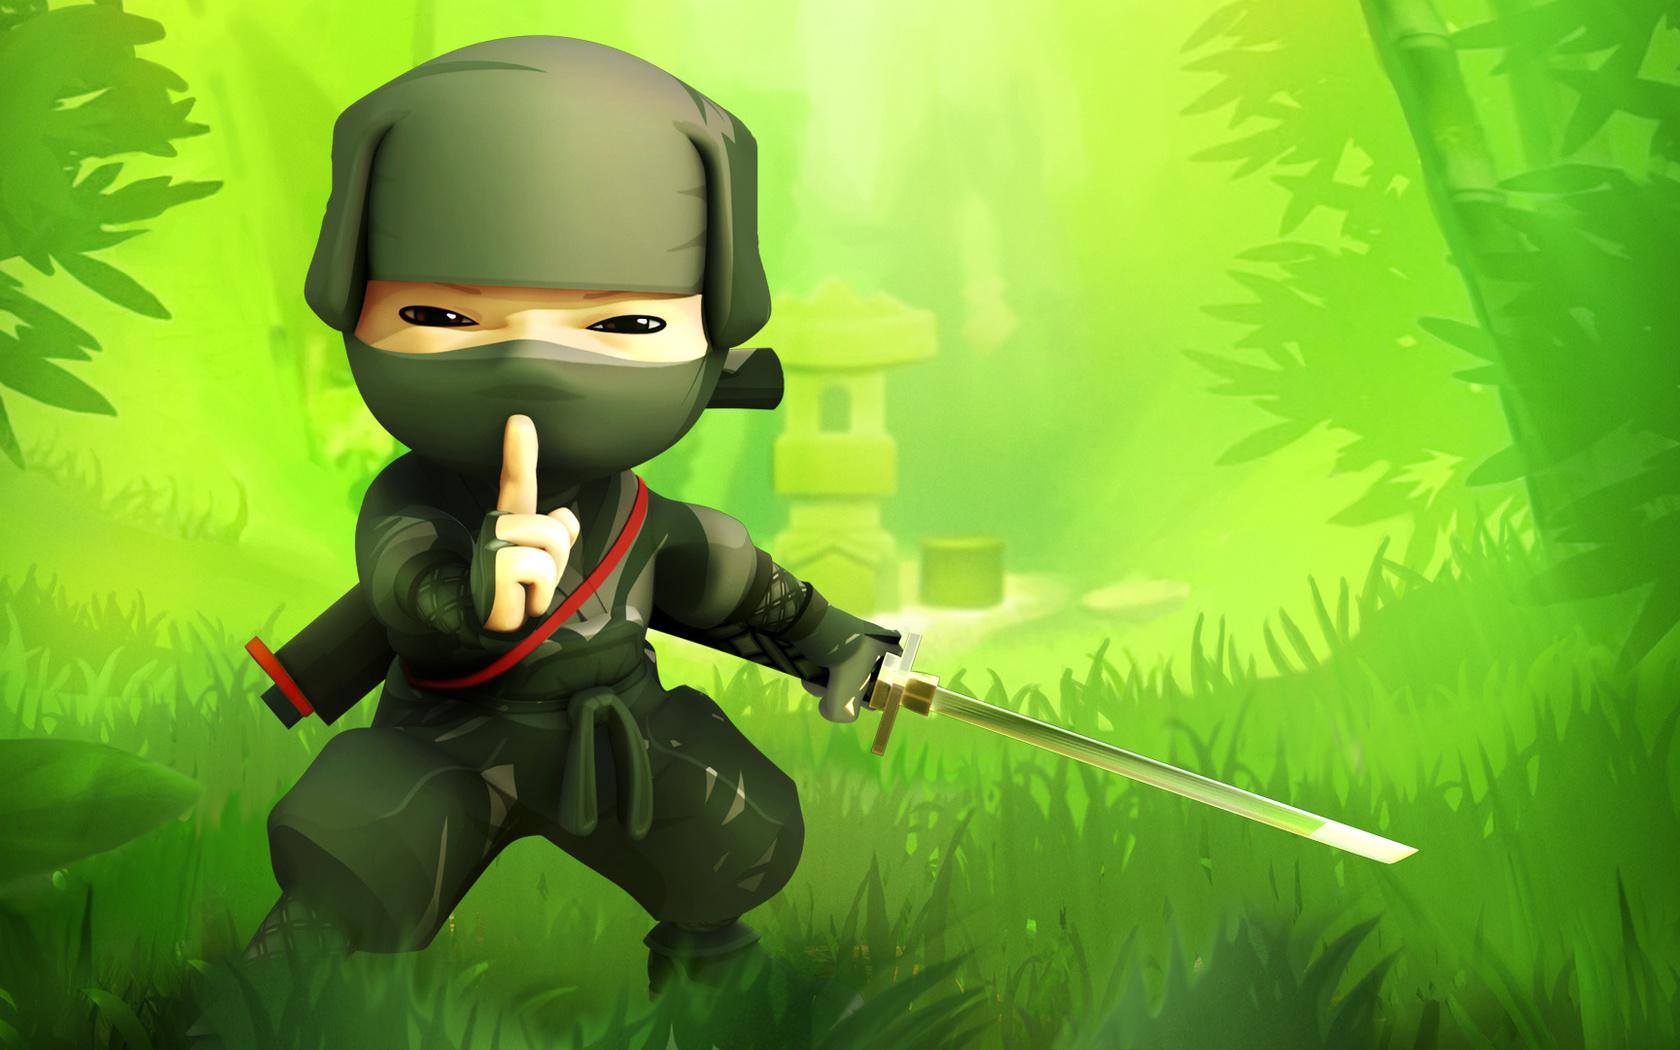 game, воин тени, ниндзя, зелень, tss, трава, Mini ninja, green, grass